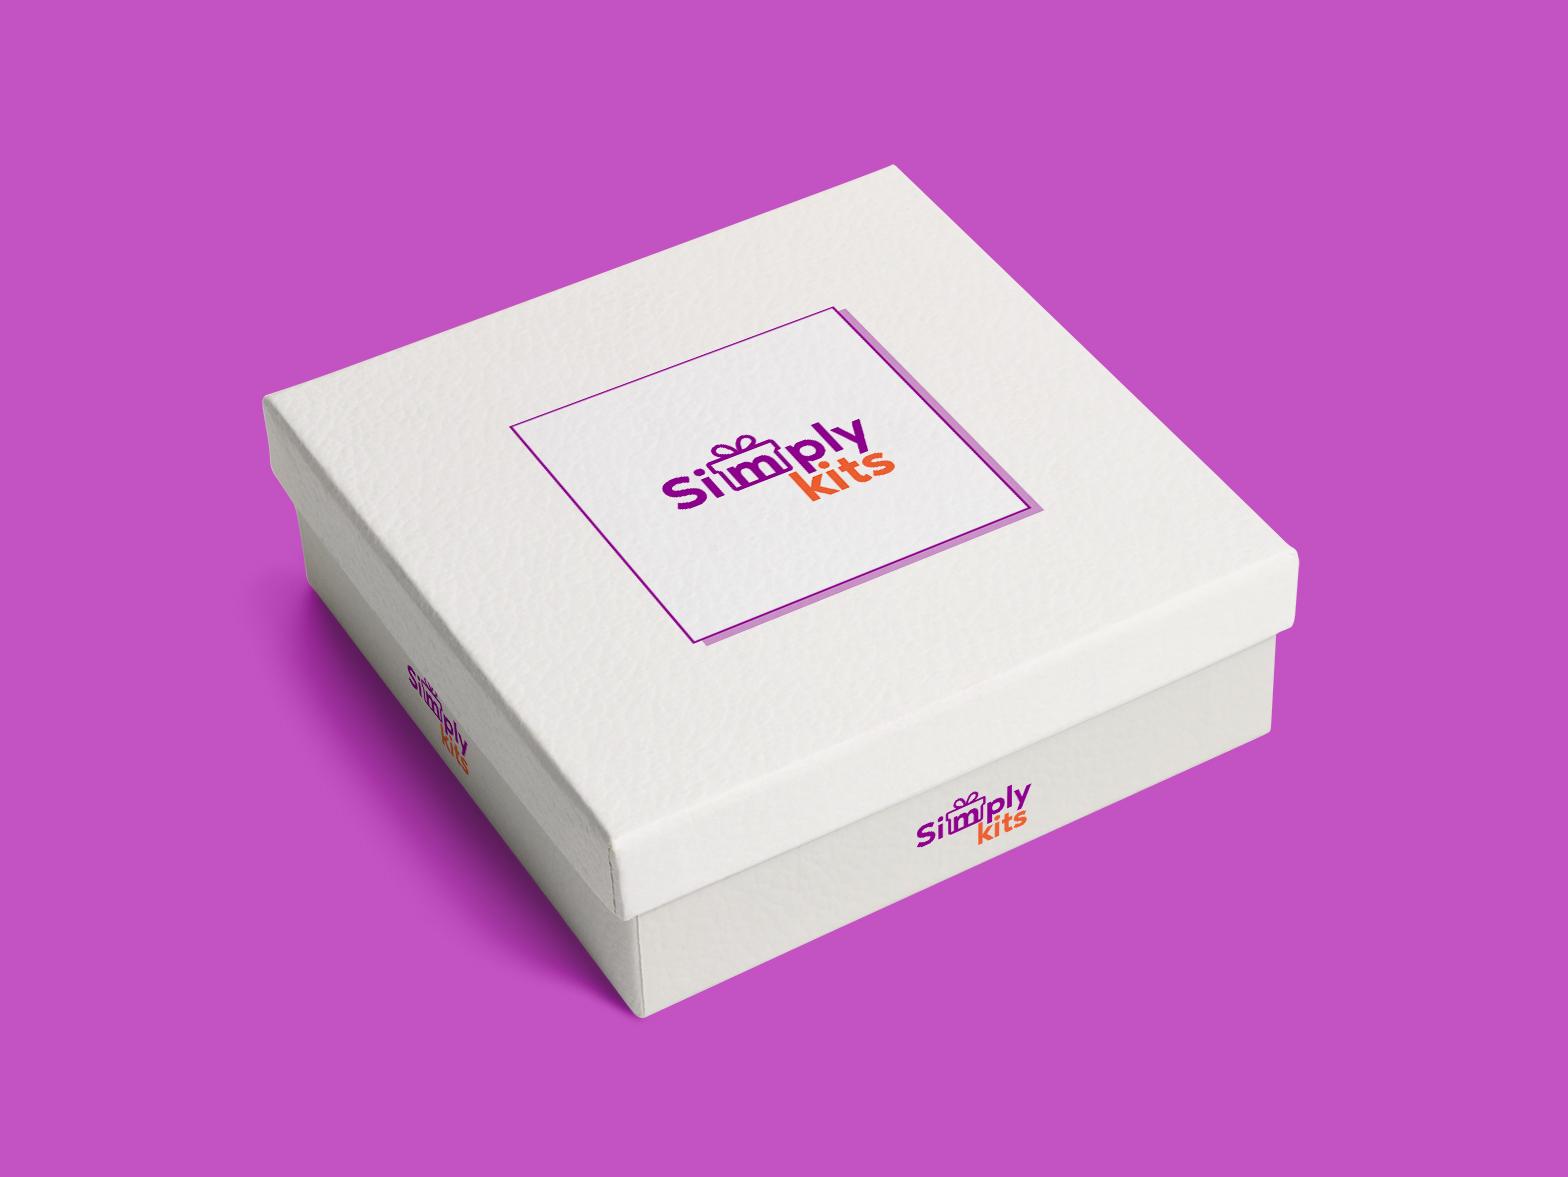 SimplyKits cpurple logolovers lovekits kits lovedesiging graphicdesign ui boxbranidng branding gift logodesigns simplykits dribbble logodesign